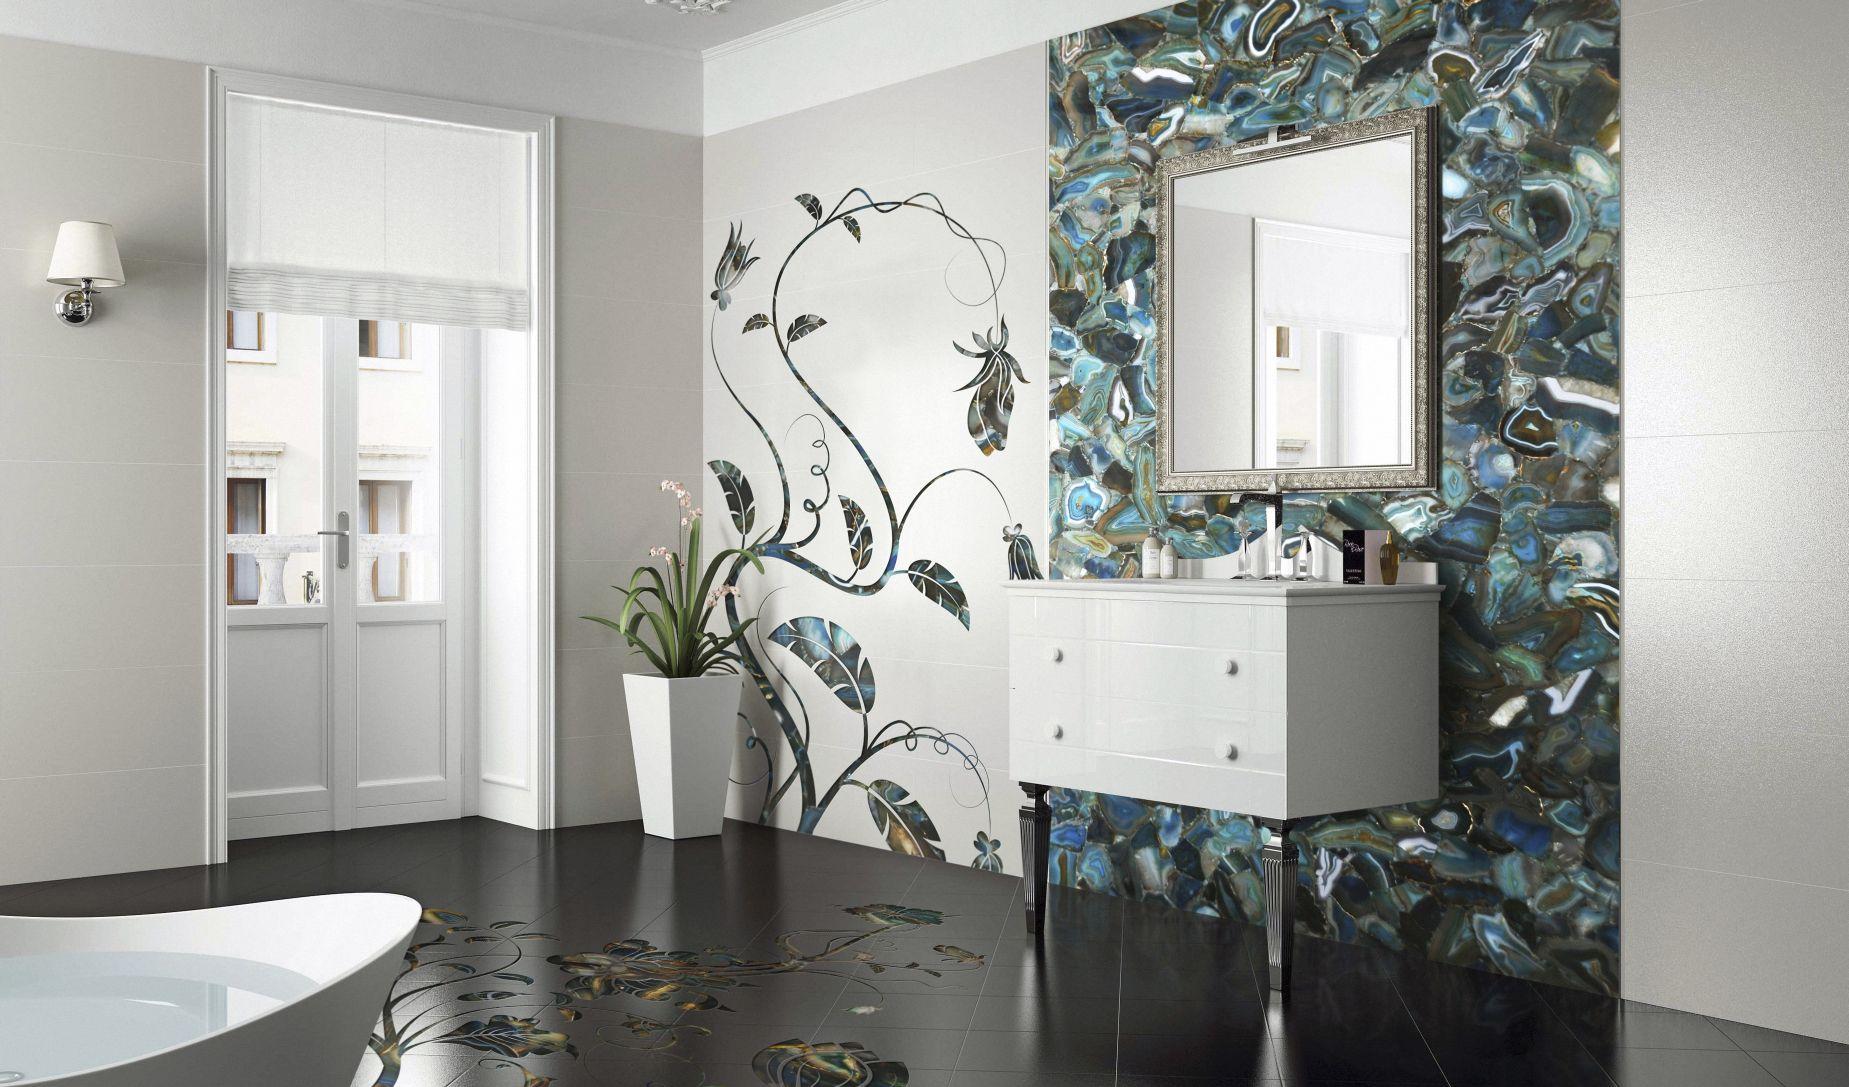 agate delta decorative wall.jpg